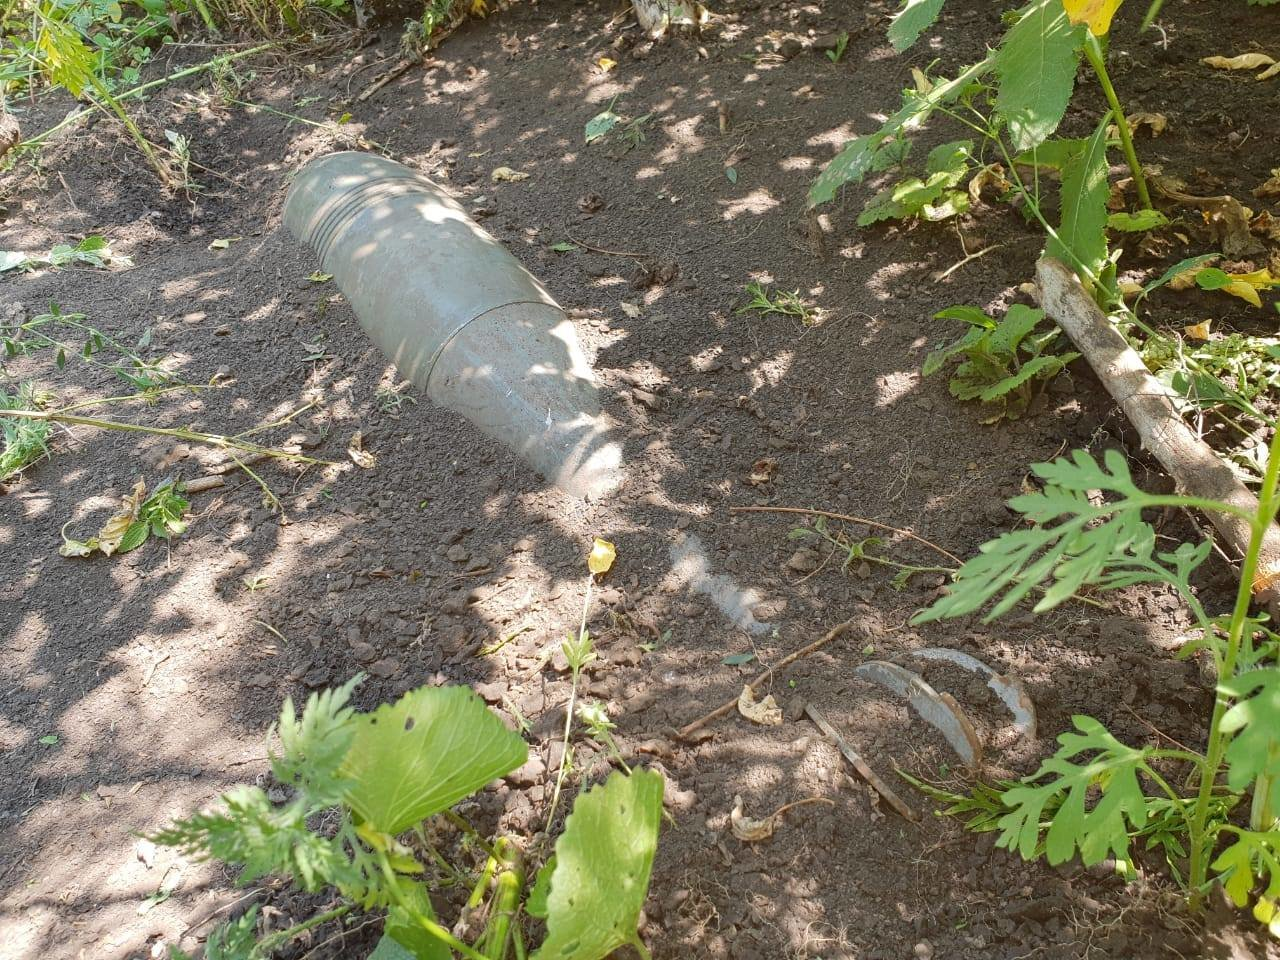 КПВВ «Майорск» временно закрыли - спасатели выявили мину, - ФОТО, фото-2